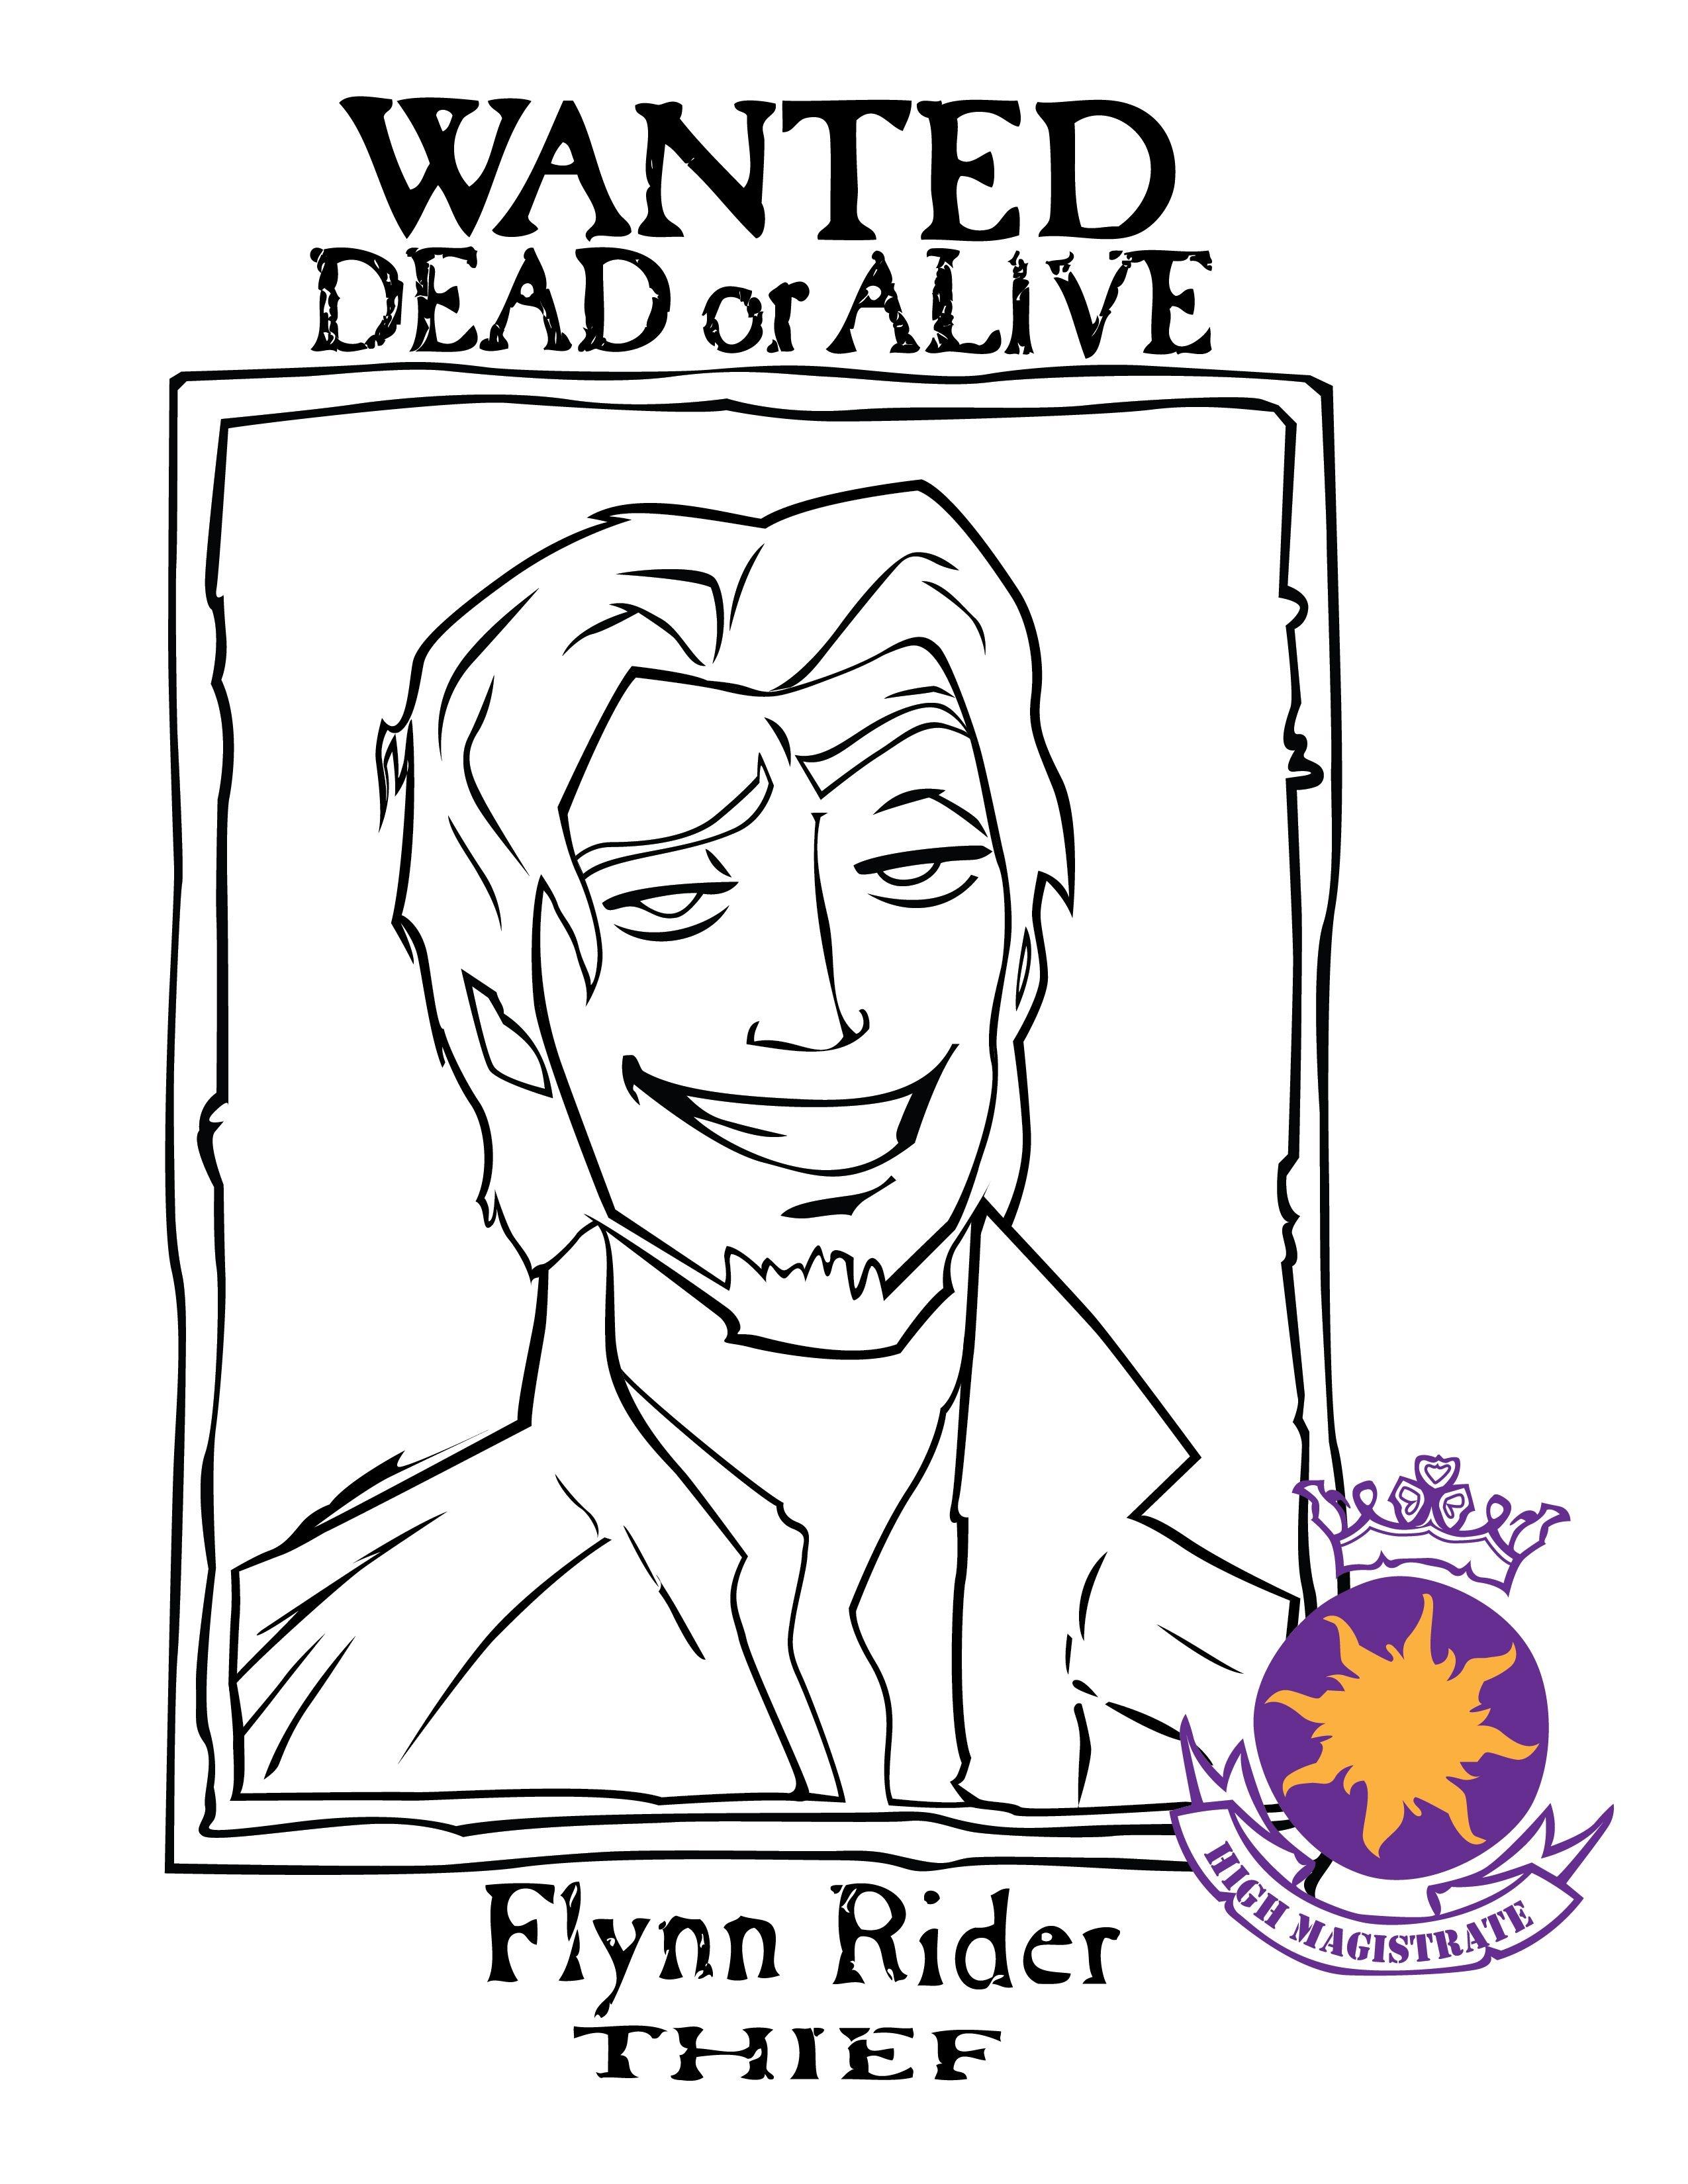 Flynn Rider Pinata - Google Search | Child Birthday Party Ideas - Free Printable Flynn Rider Wanted Poster